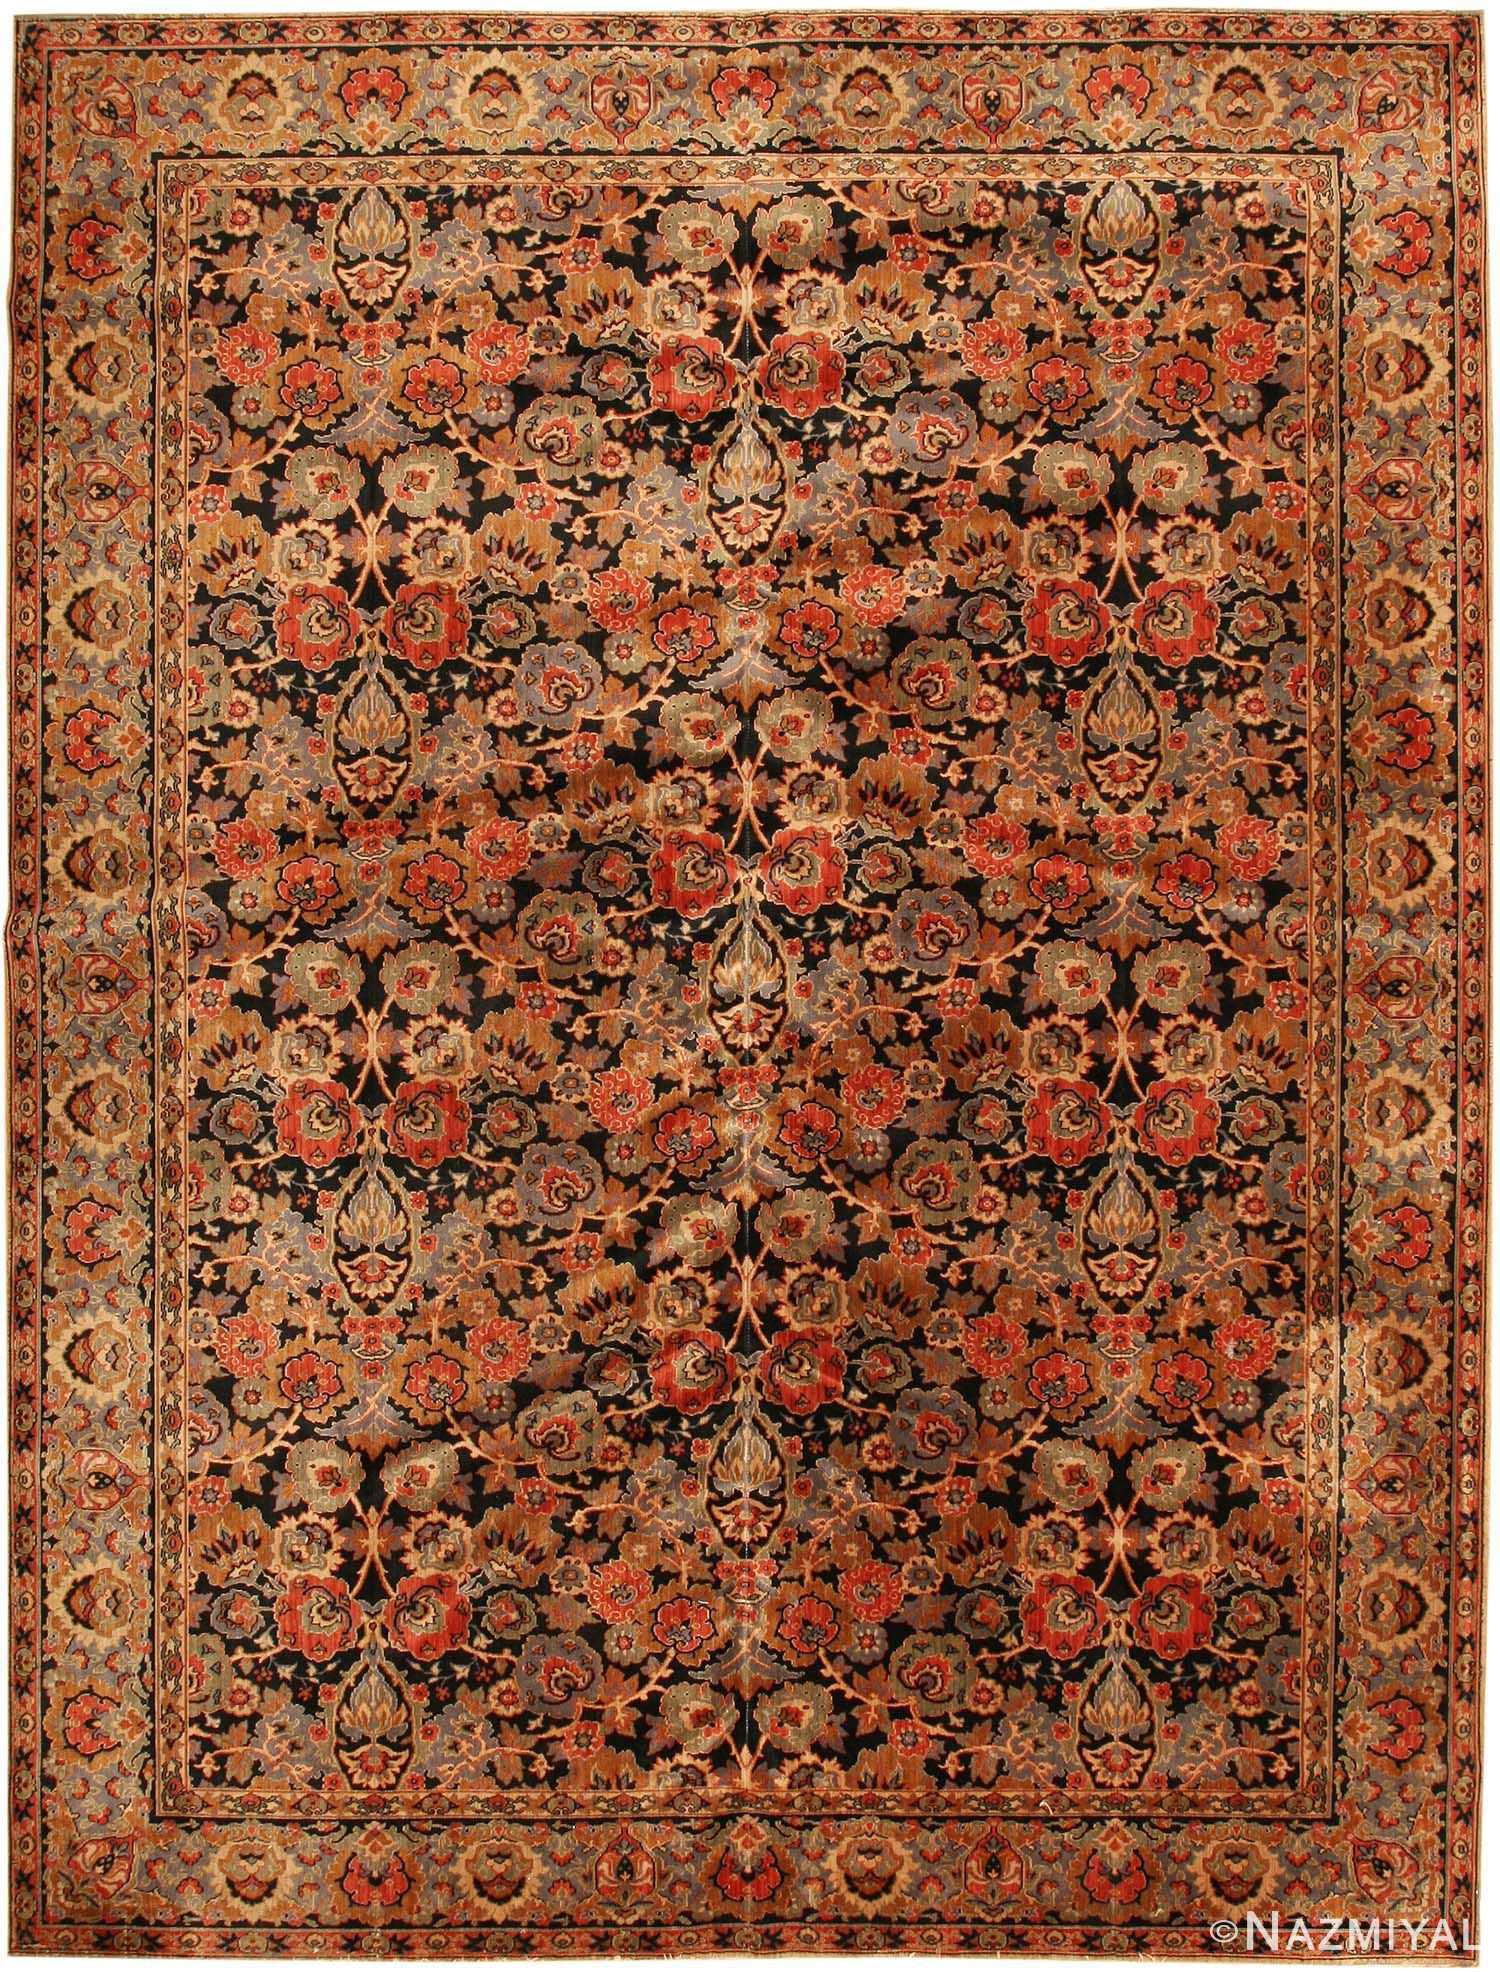 antique english axminster rug 2442 Nazmiyal